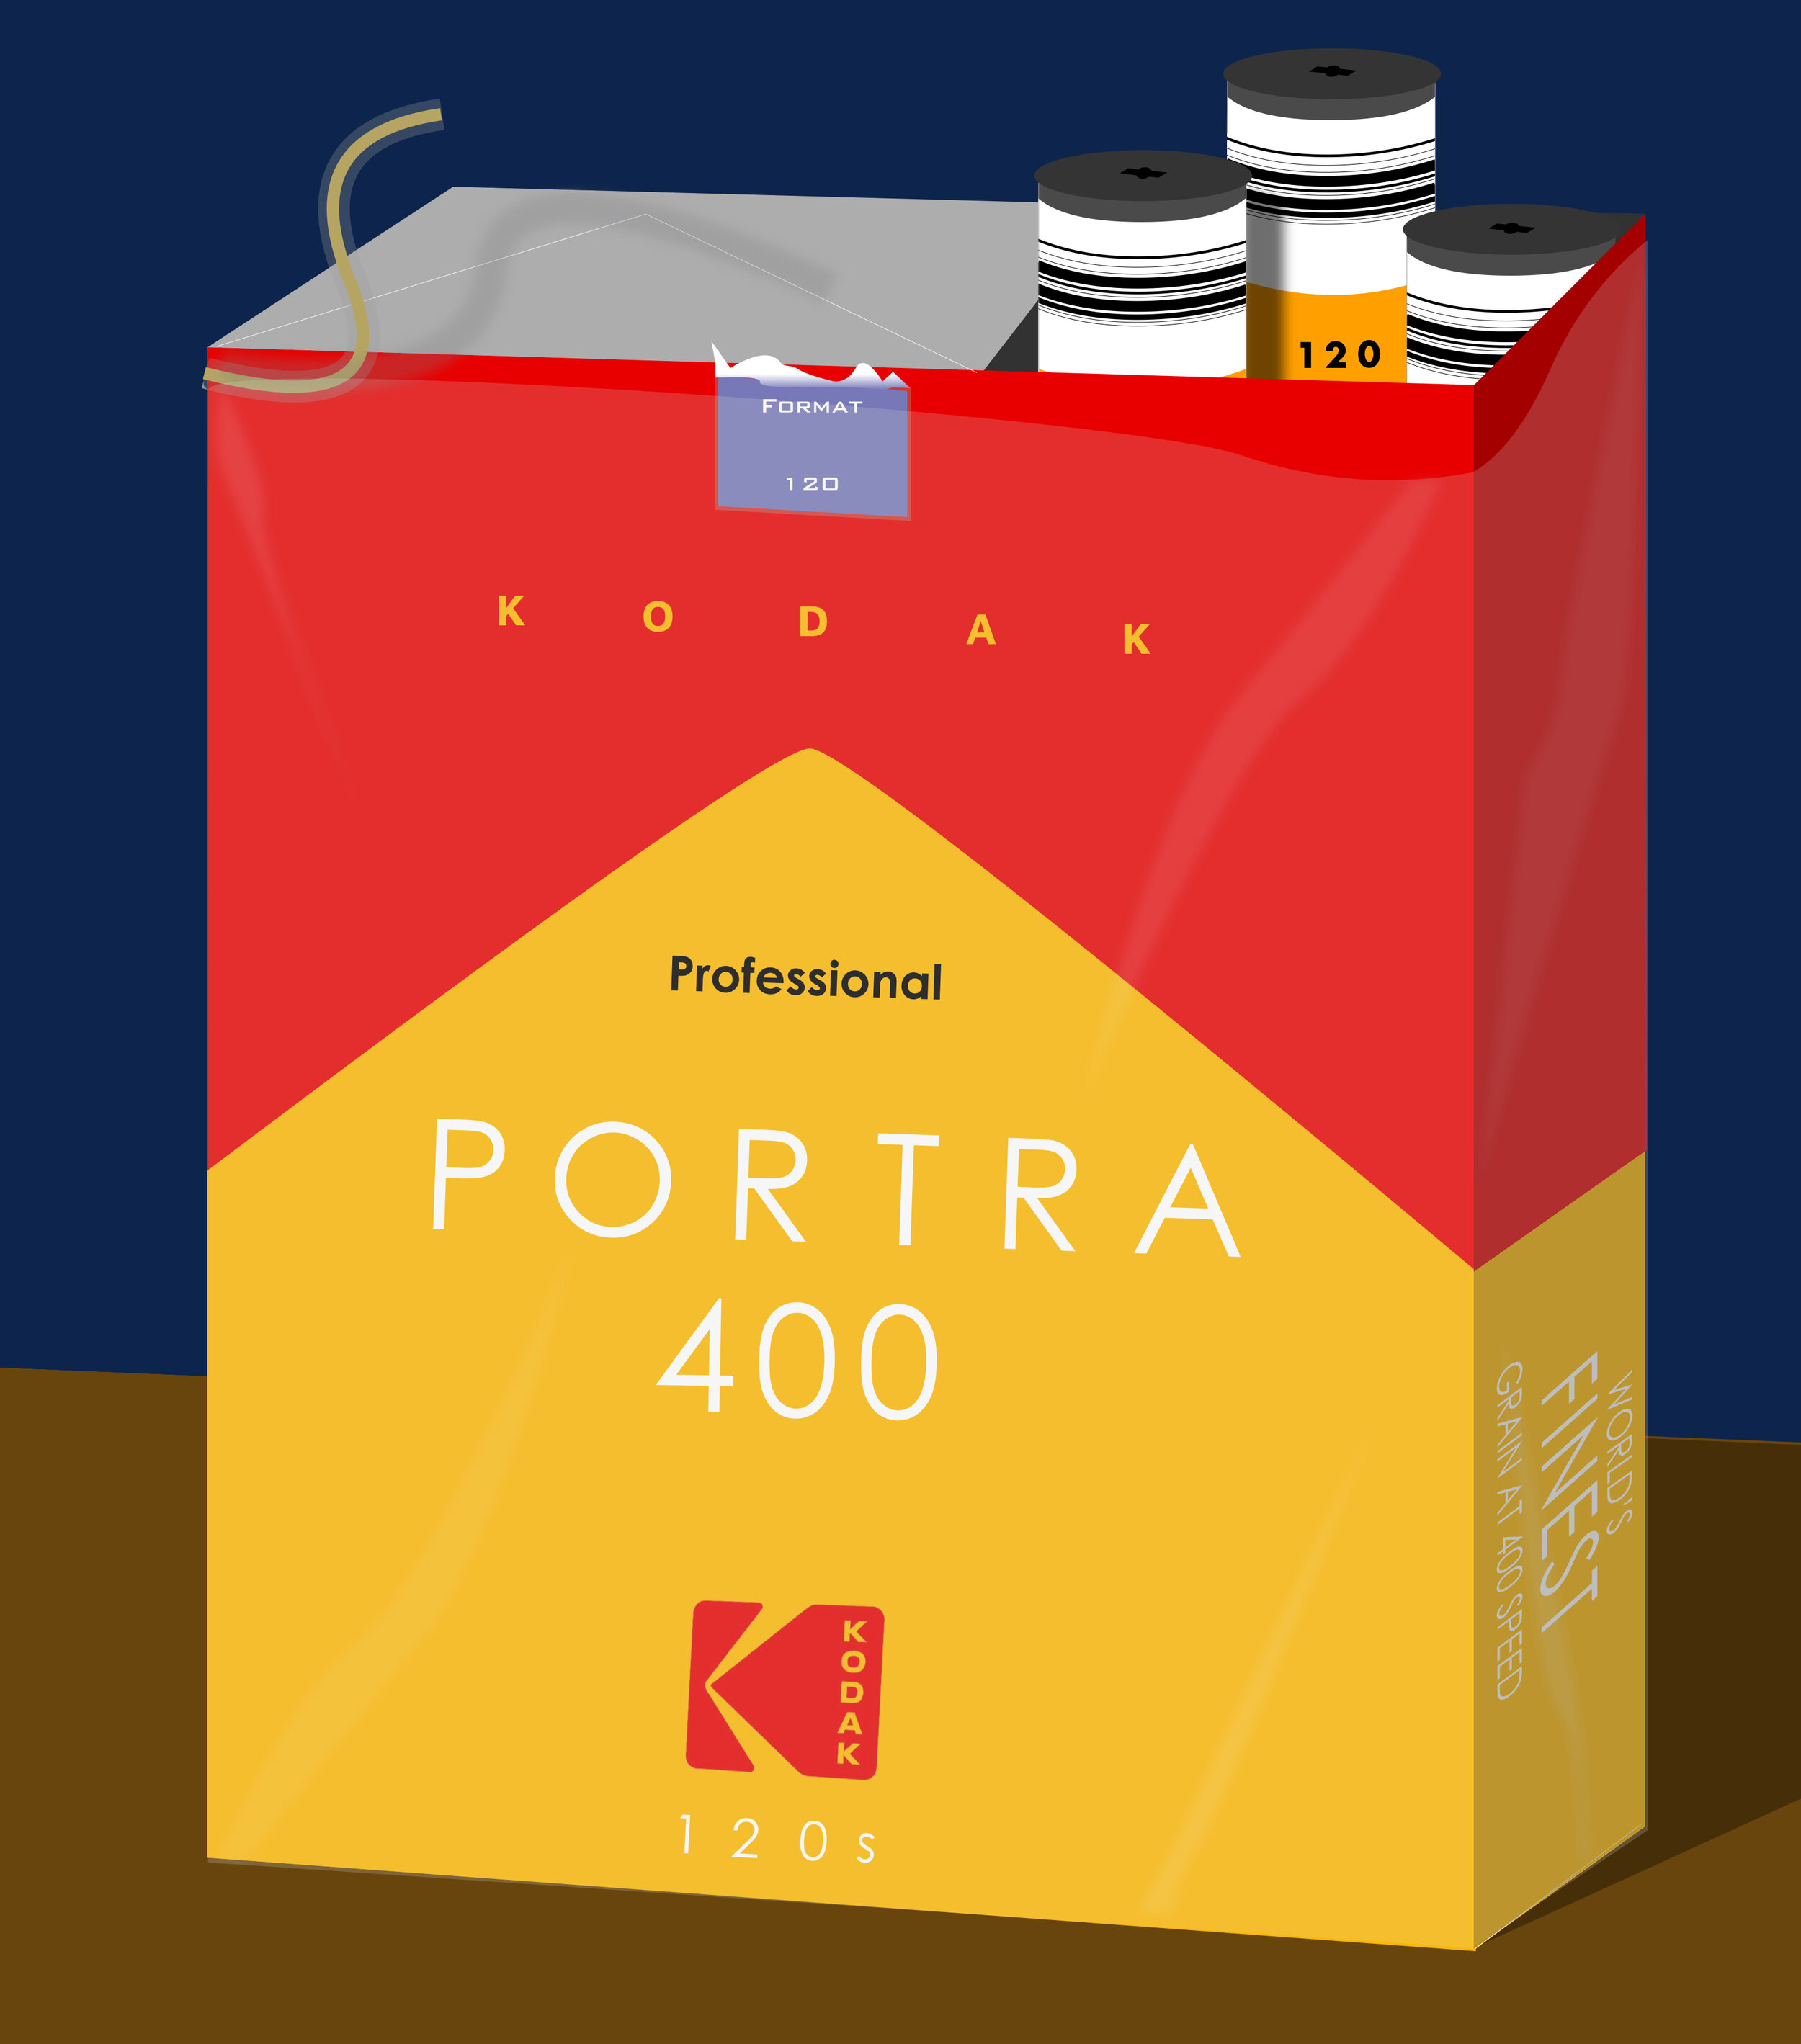 20191009-portfolio-illustrations.jpg